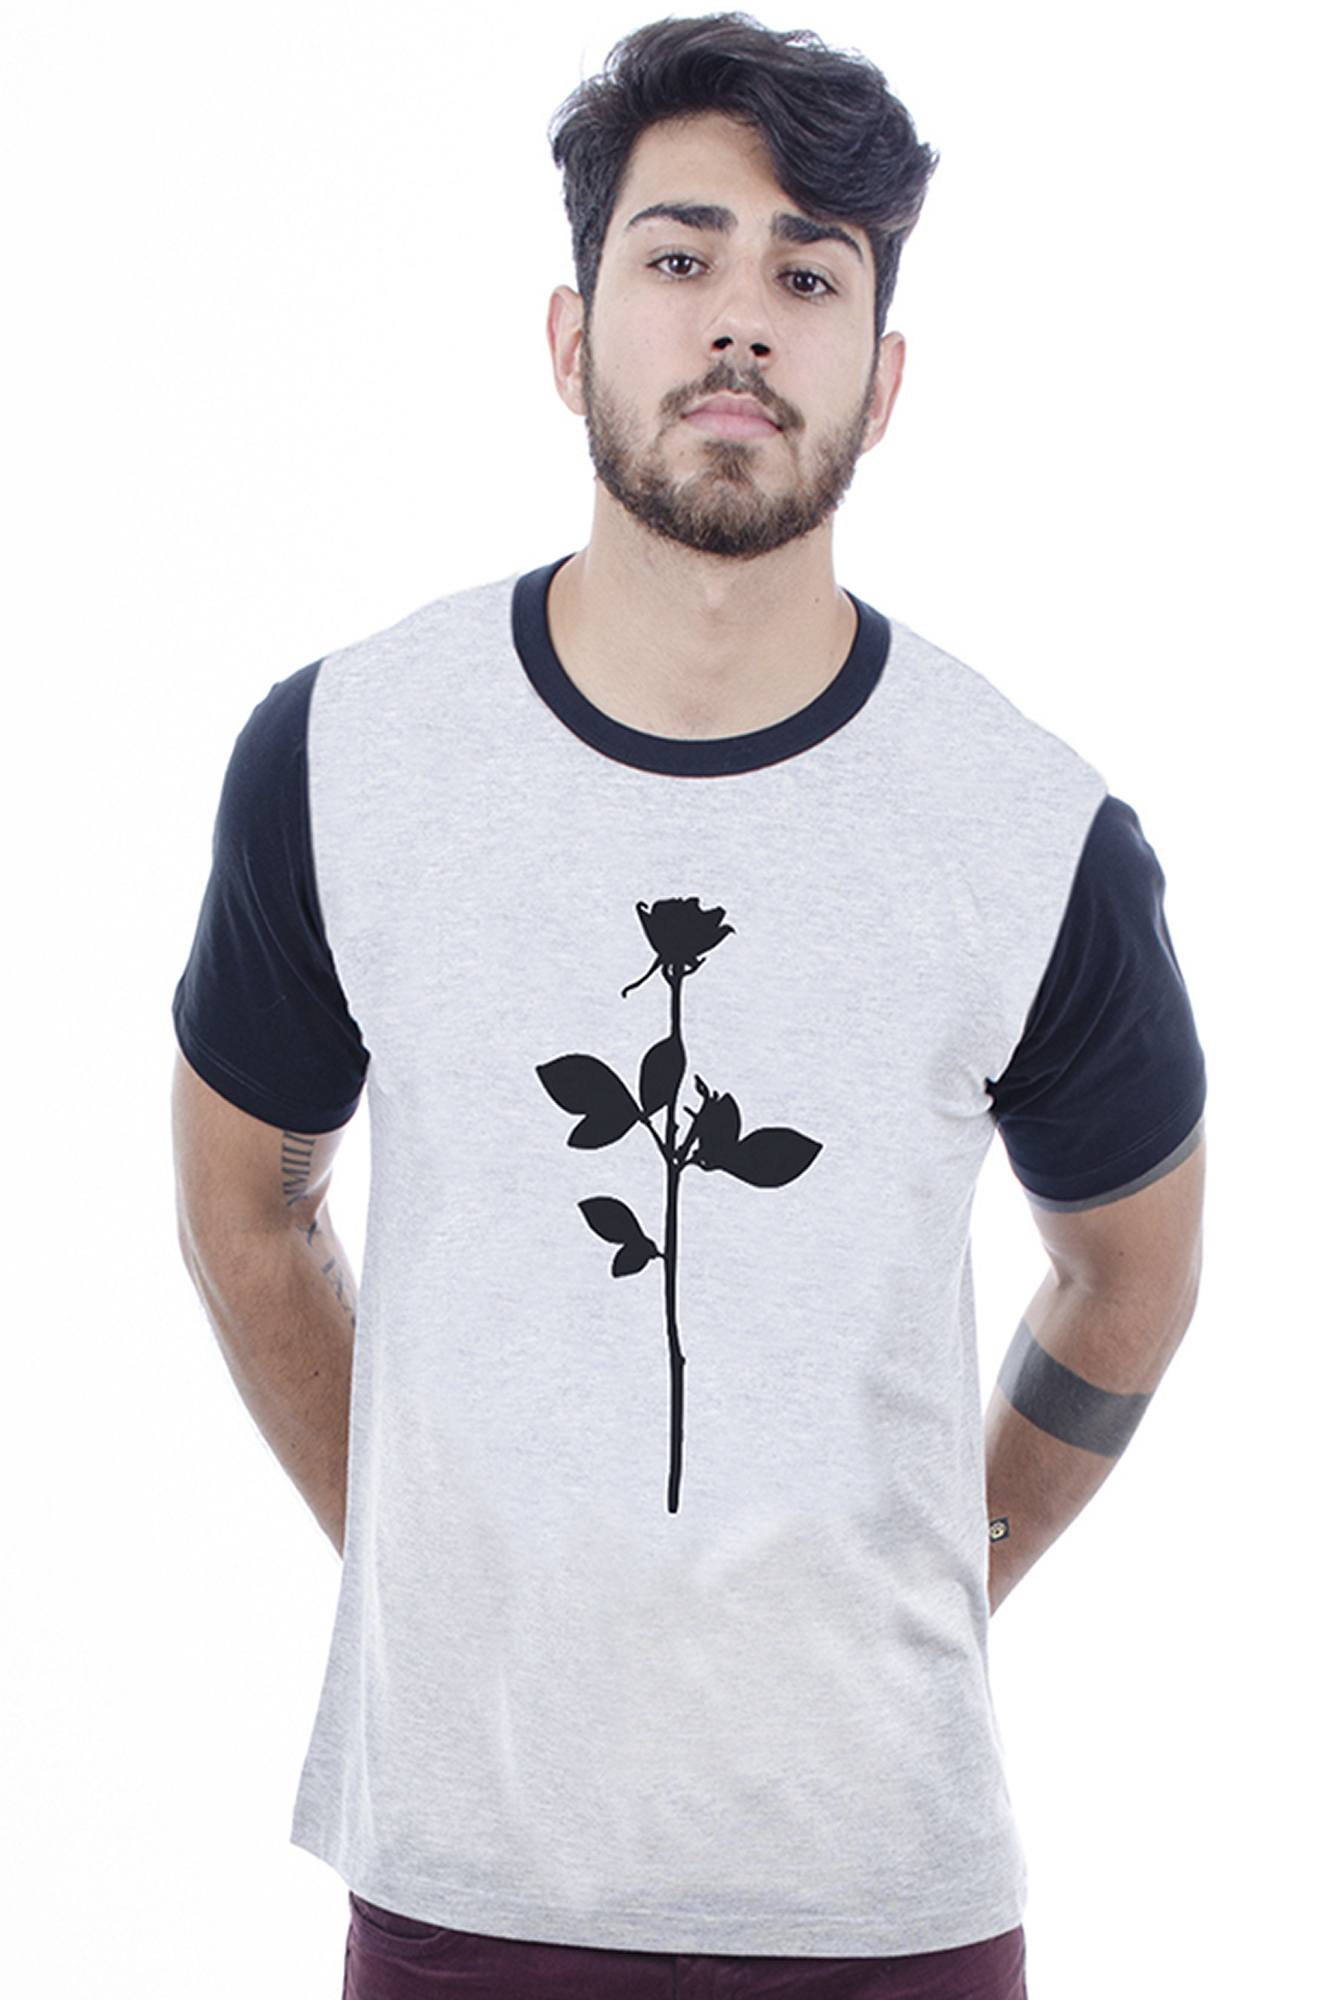 Camiseta Masculina estampada Silence Cinza Mescla Hardivision